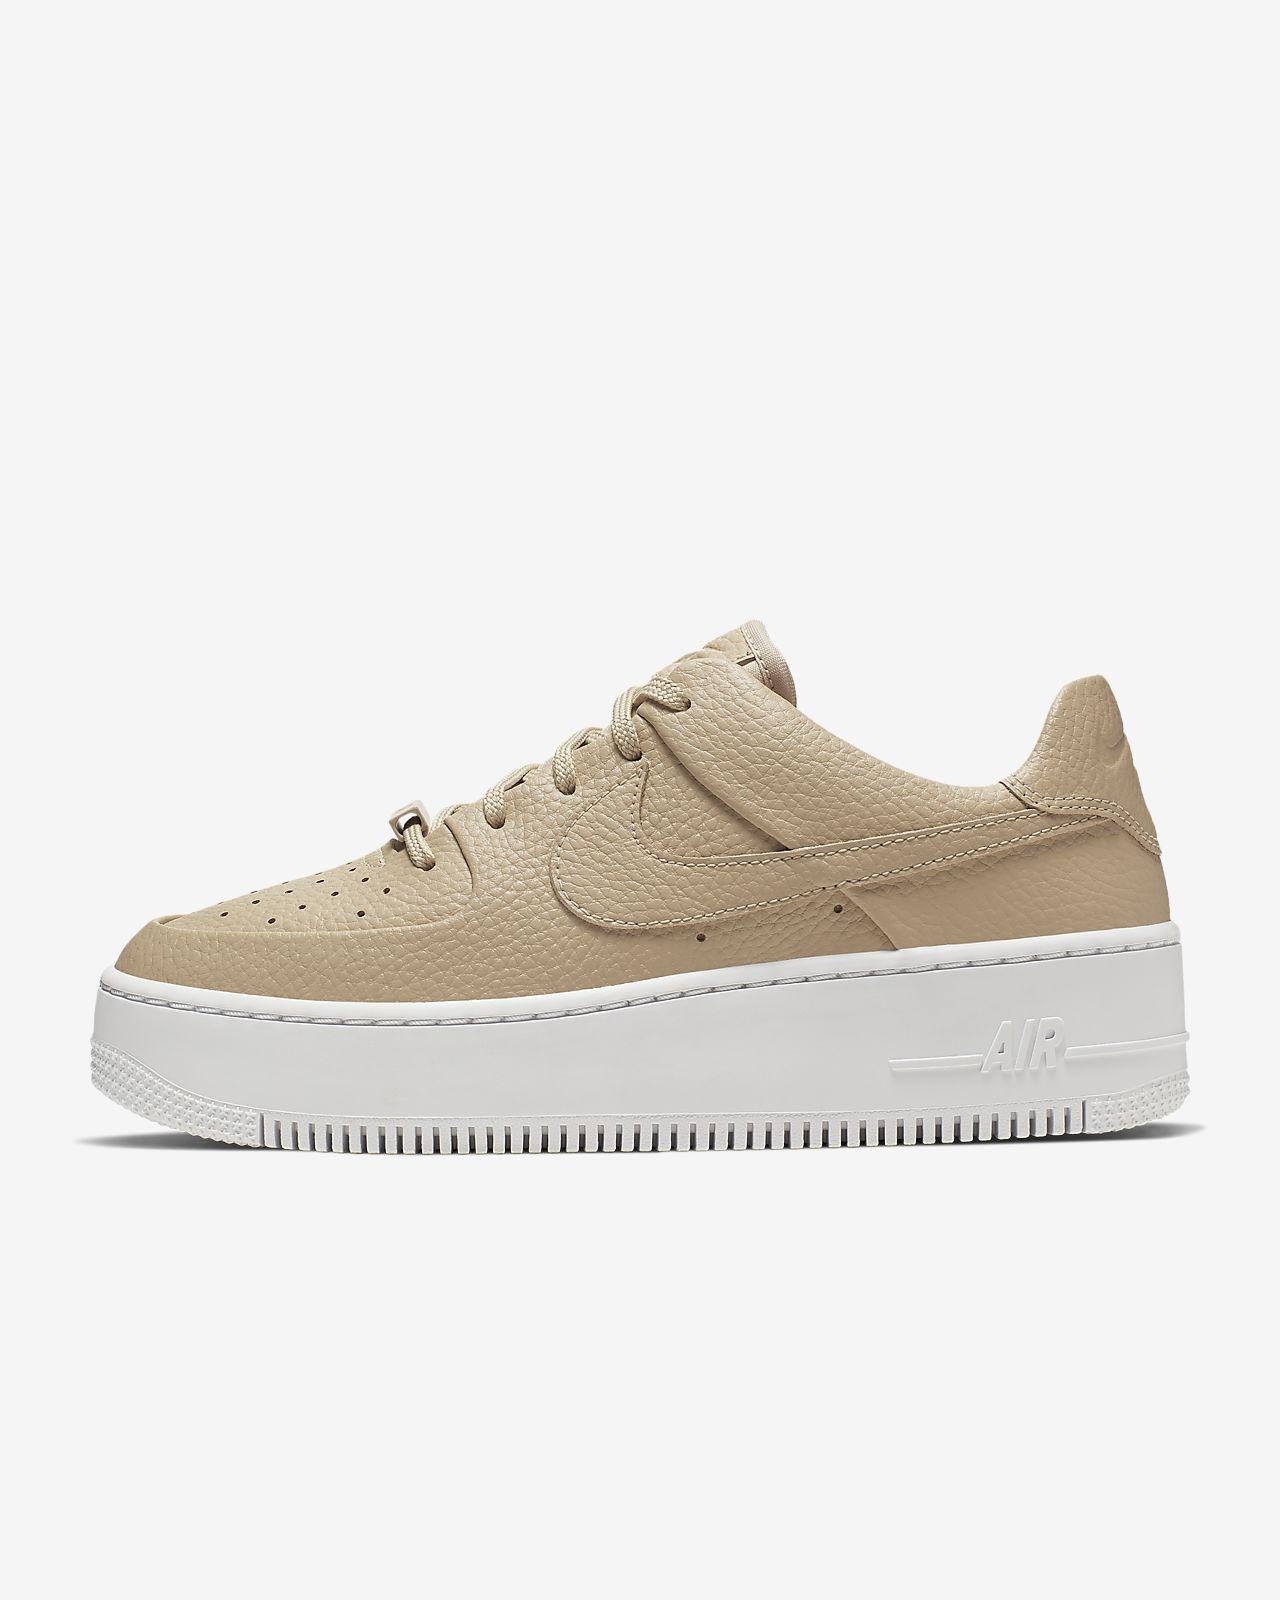 Sapatilhas Nike Air Force 1 Sage Low 2 para mulher